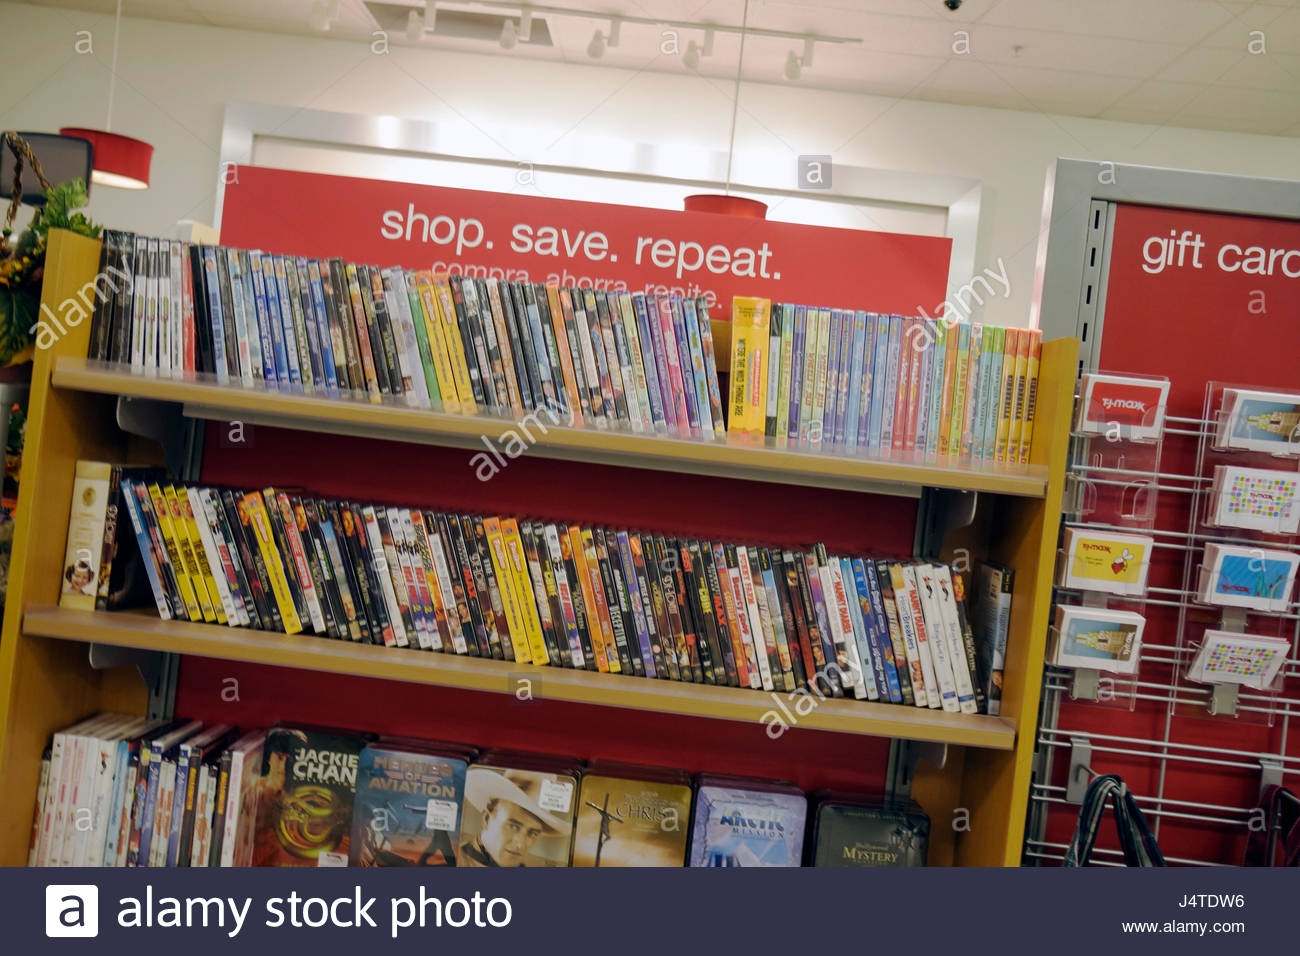 Checkout Area Stockfotos & Checkout Area Bilder - Alamy